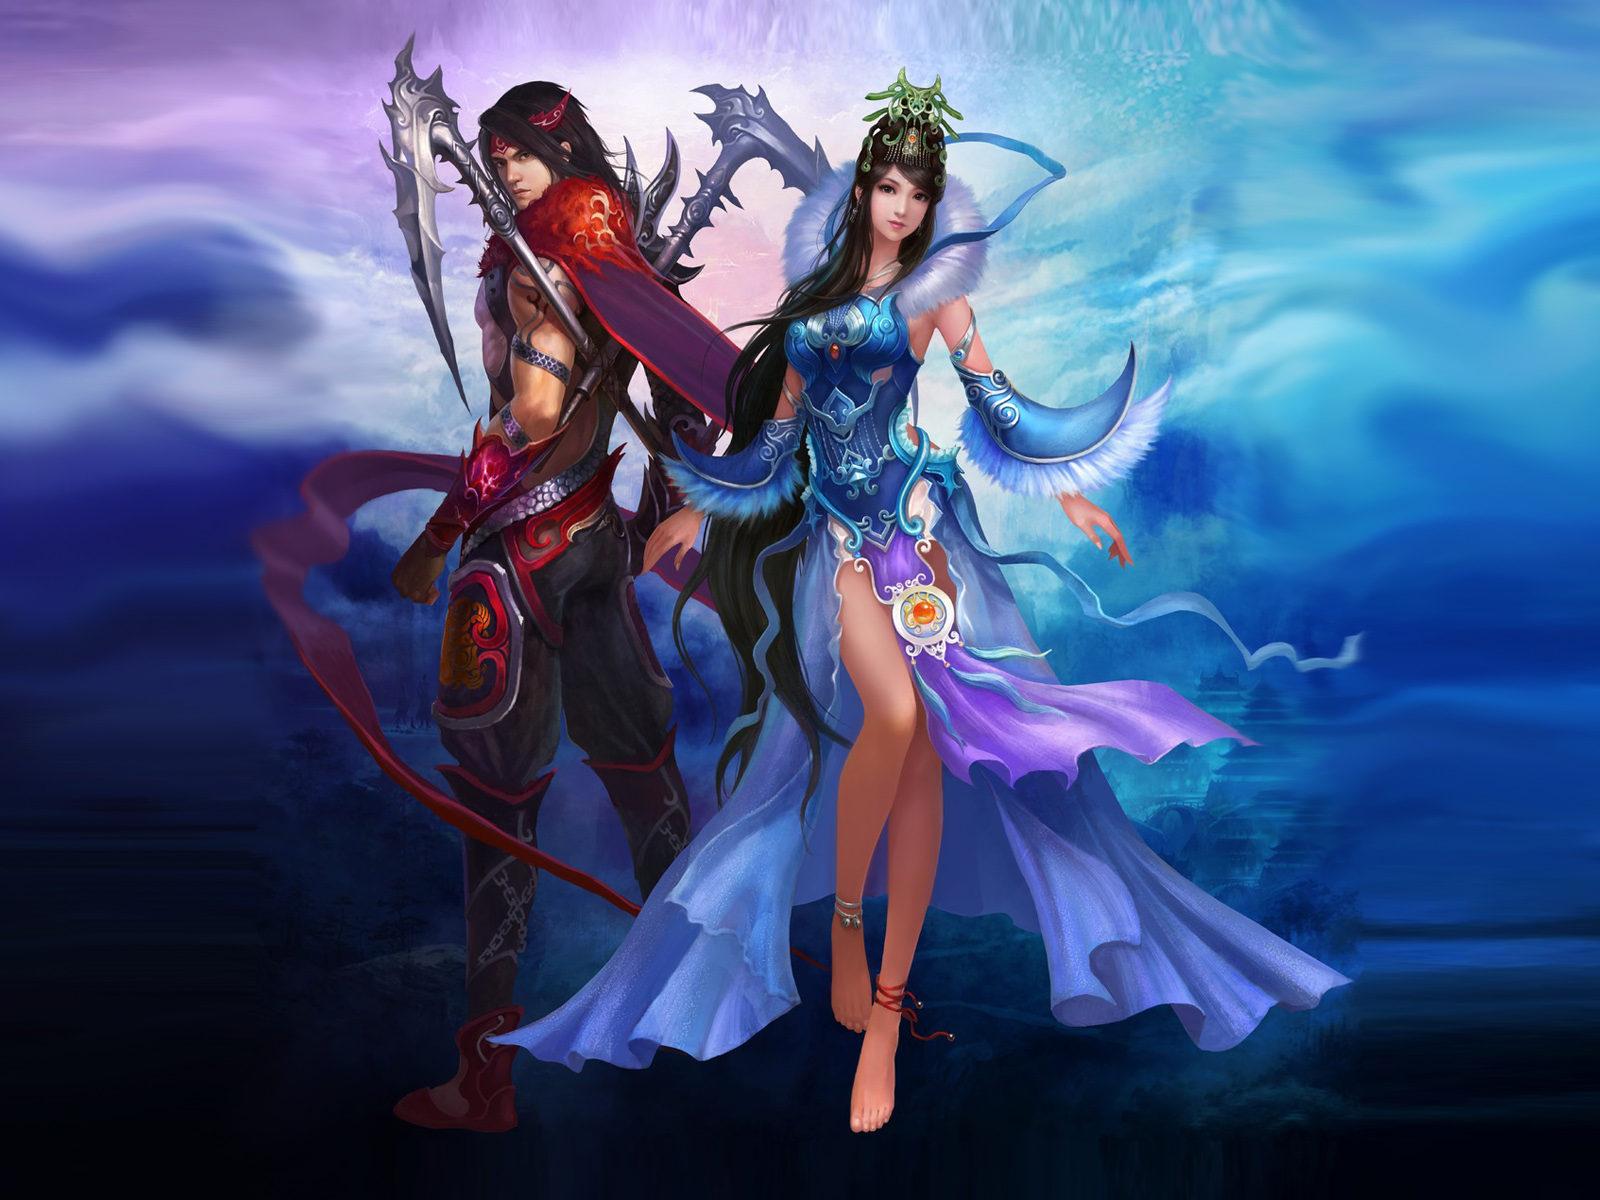 Iphone 5 Asian Girl Wallpaper Jade Dynasty Video Game Desktop Wallpaper Hd Resolution